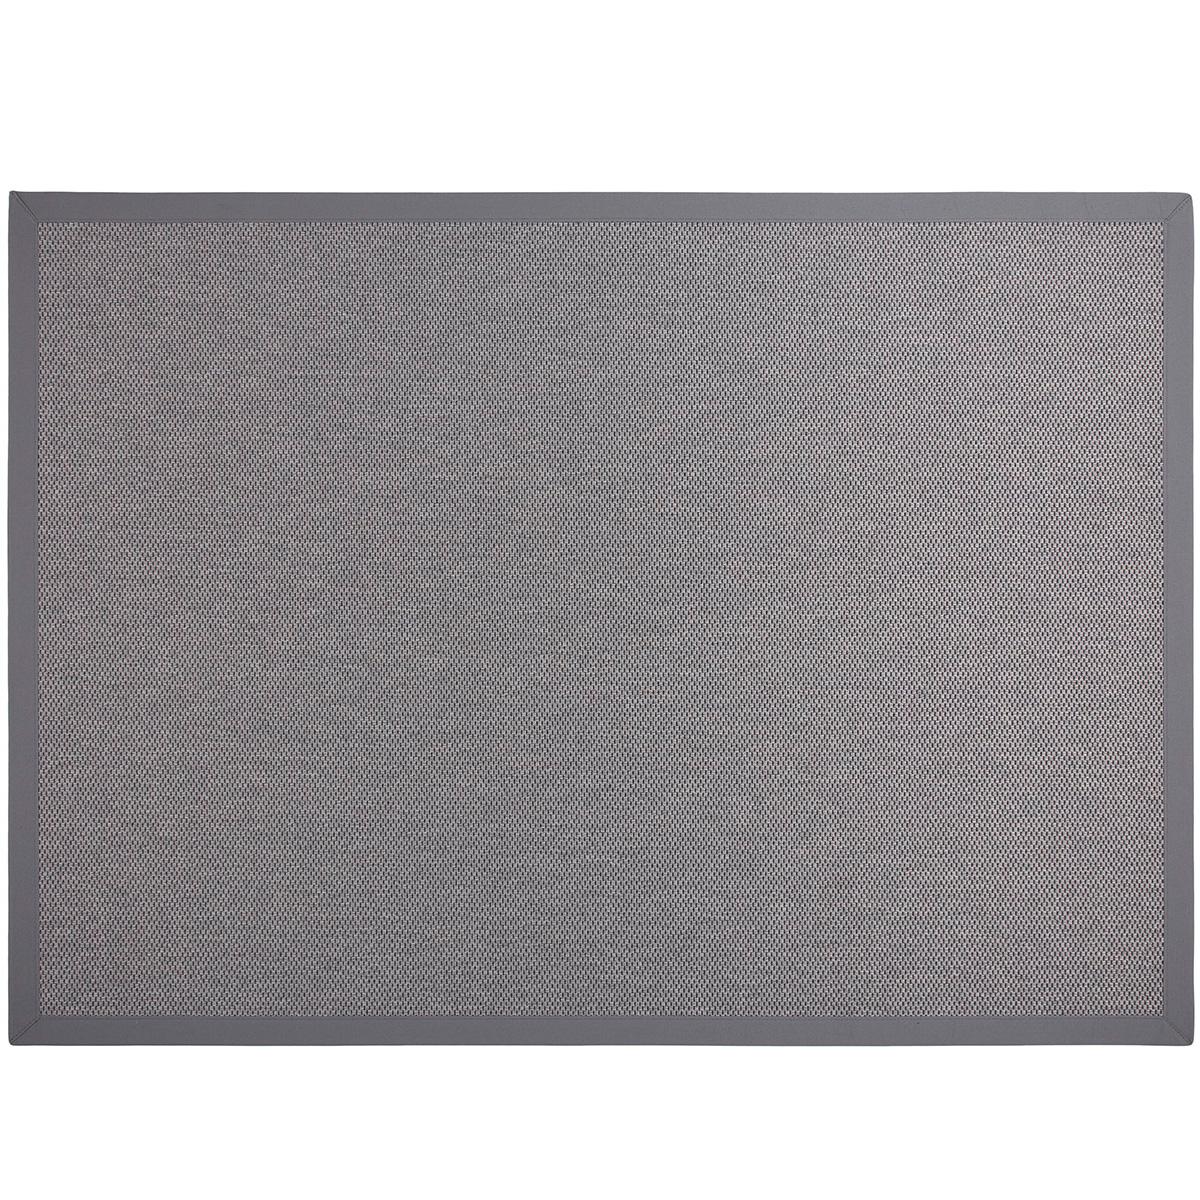 Vloerkleed Brinker Dynamo Silver | 200 x 300 cm